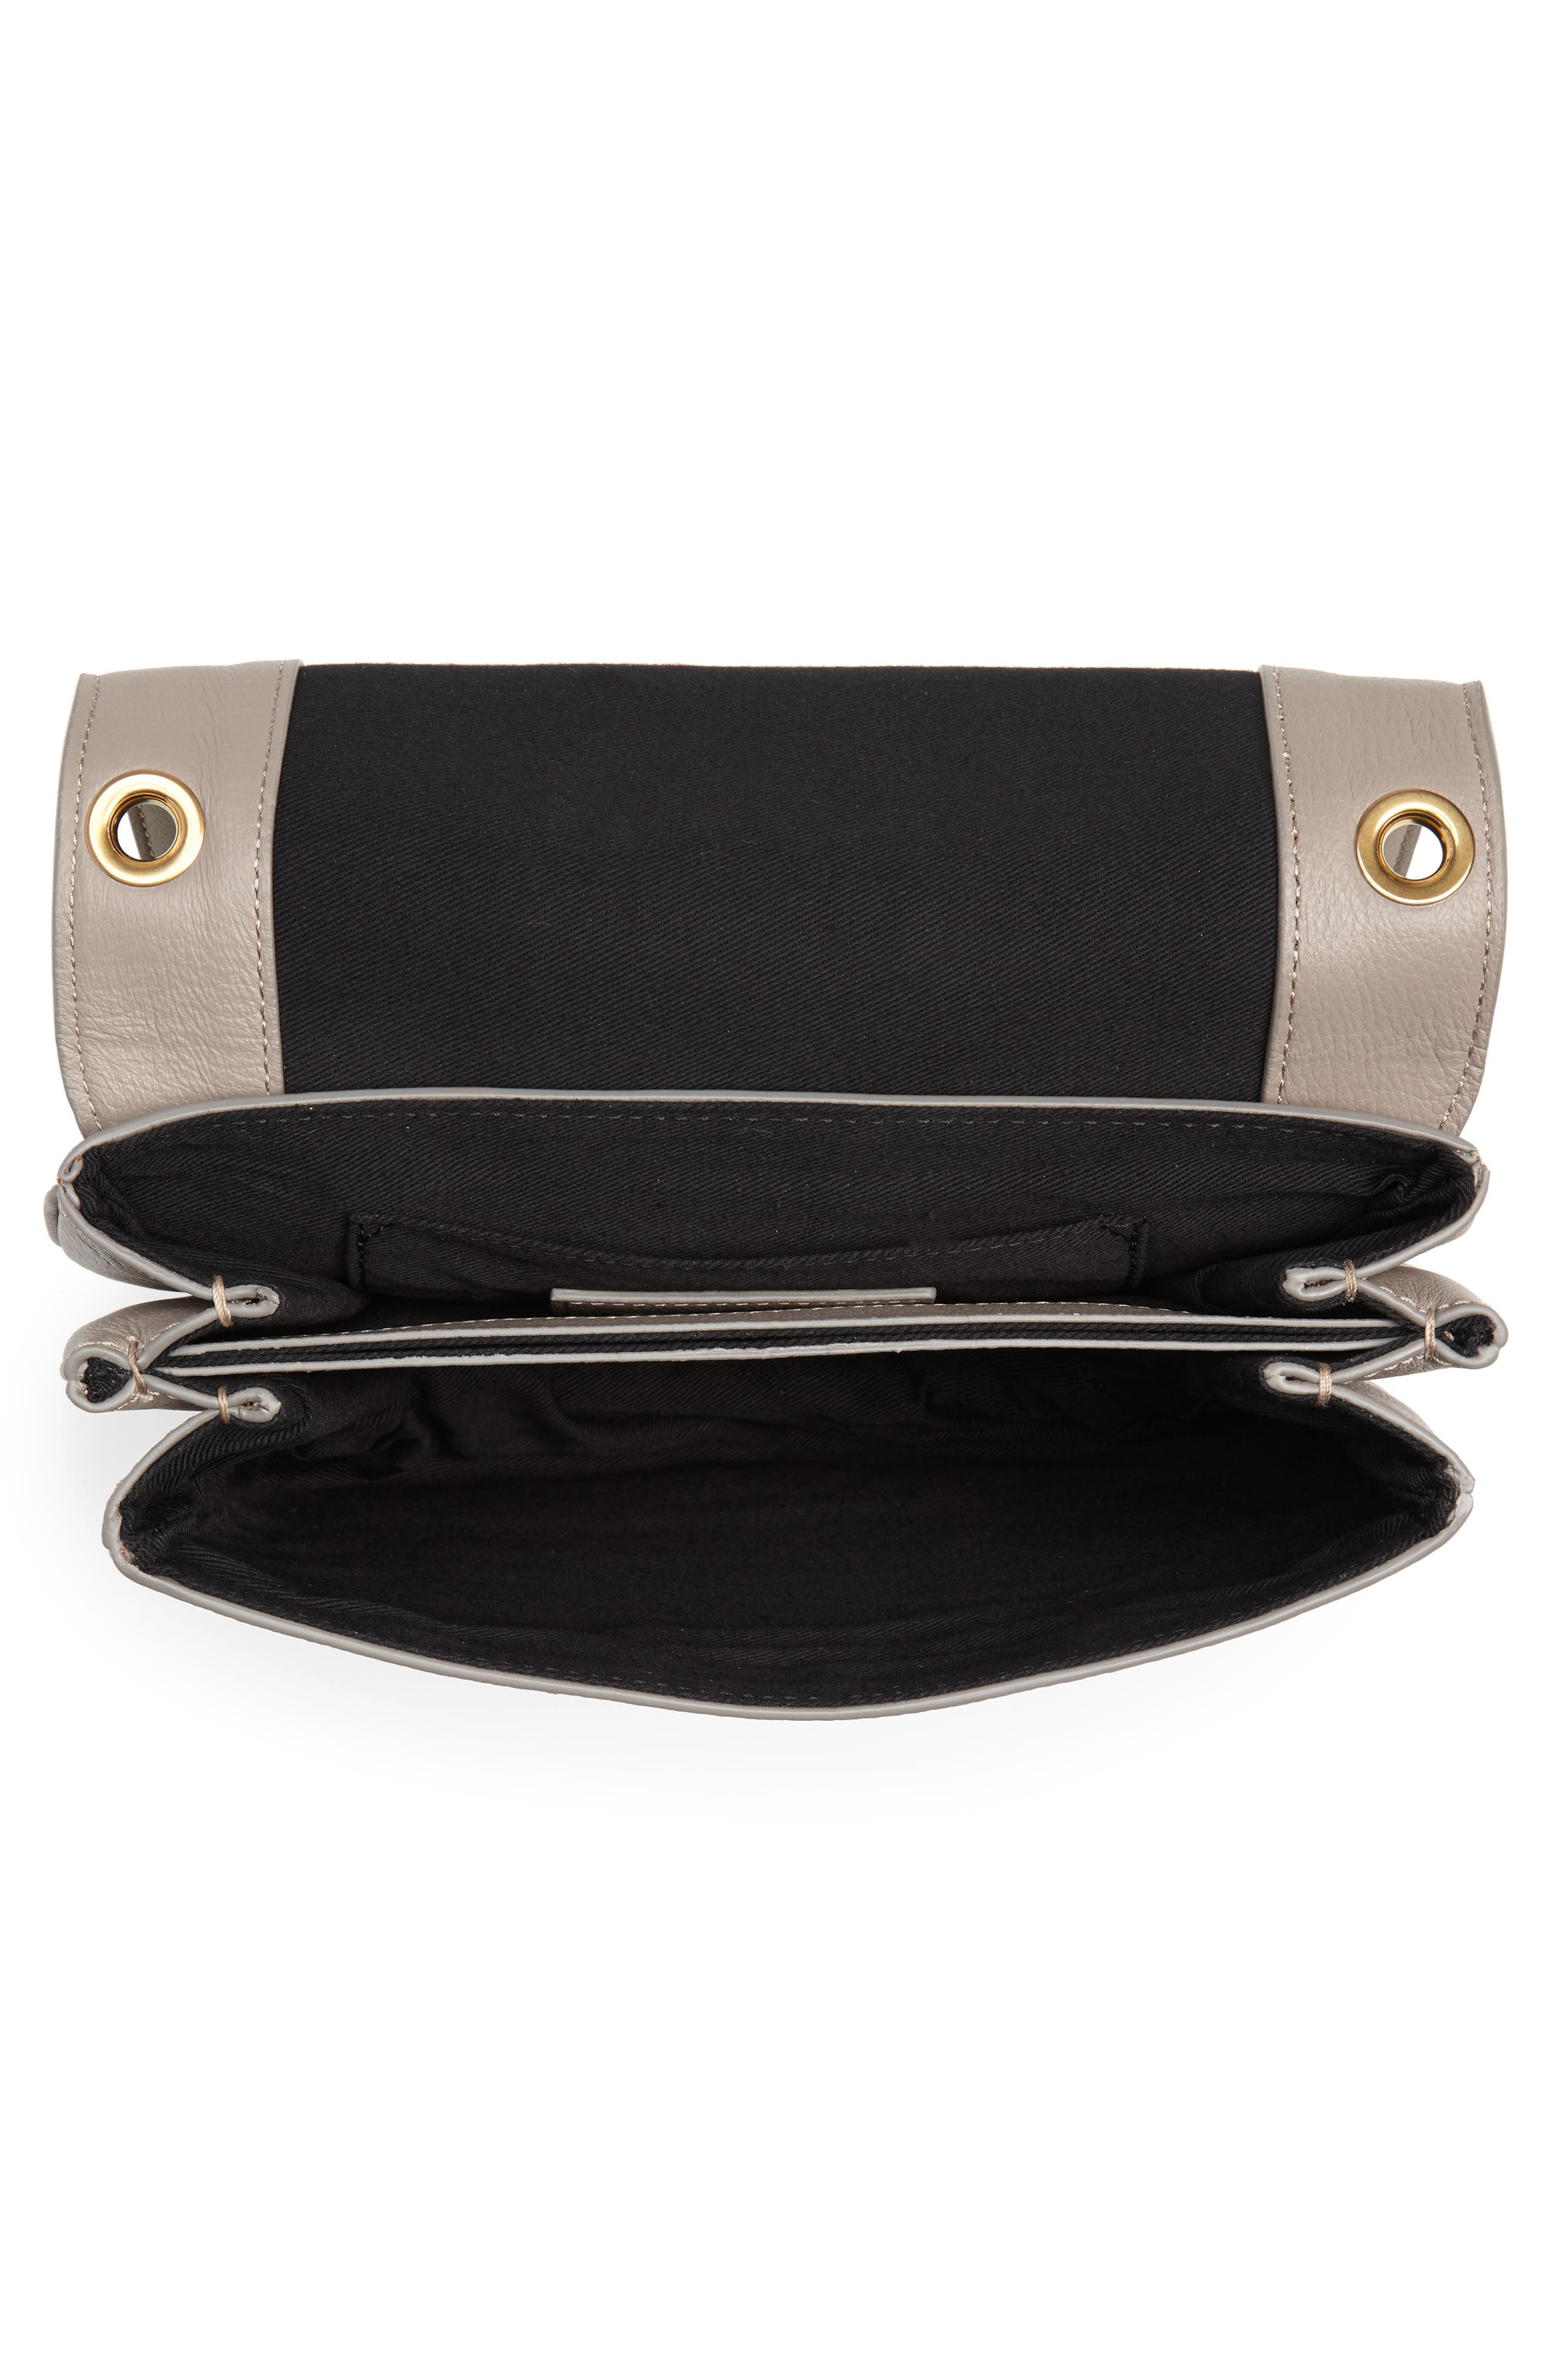 Hana Small Leather Crossbody Bag,                             Alternate thumbnail 22, color,